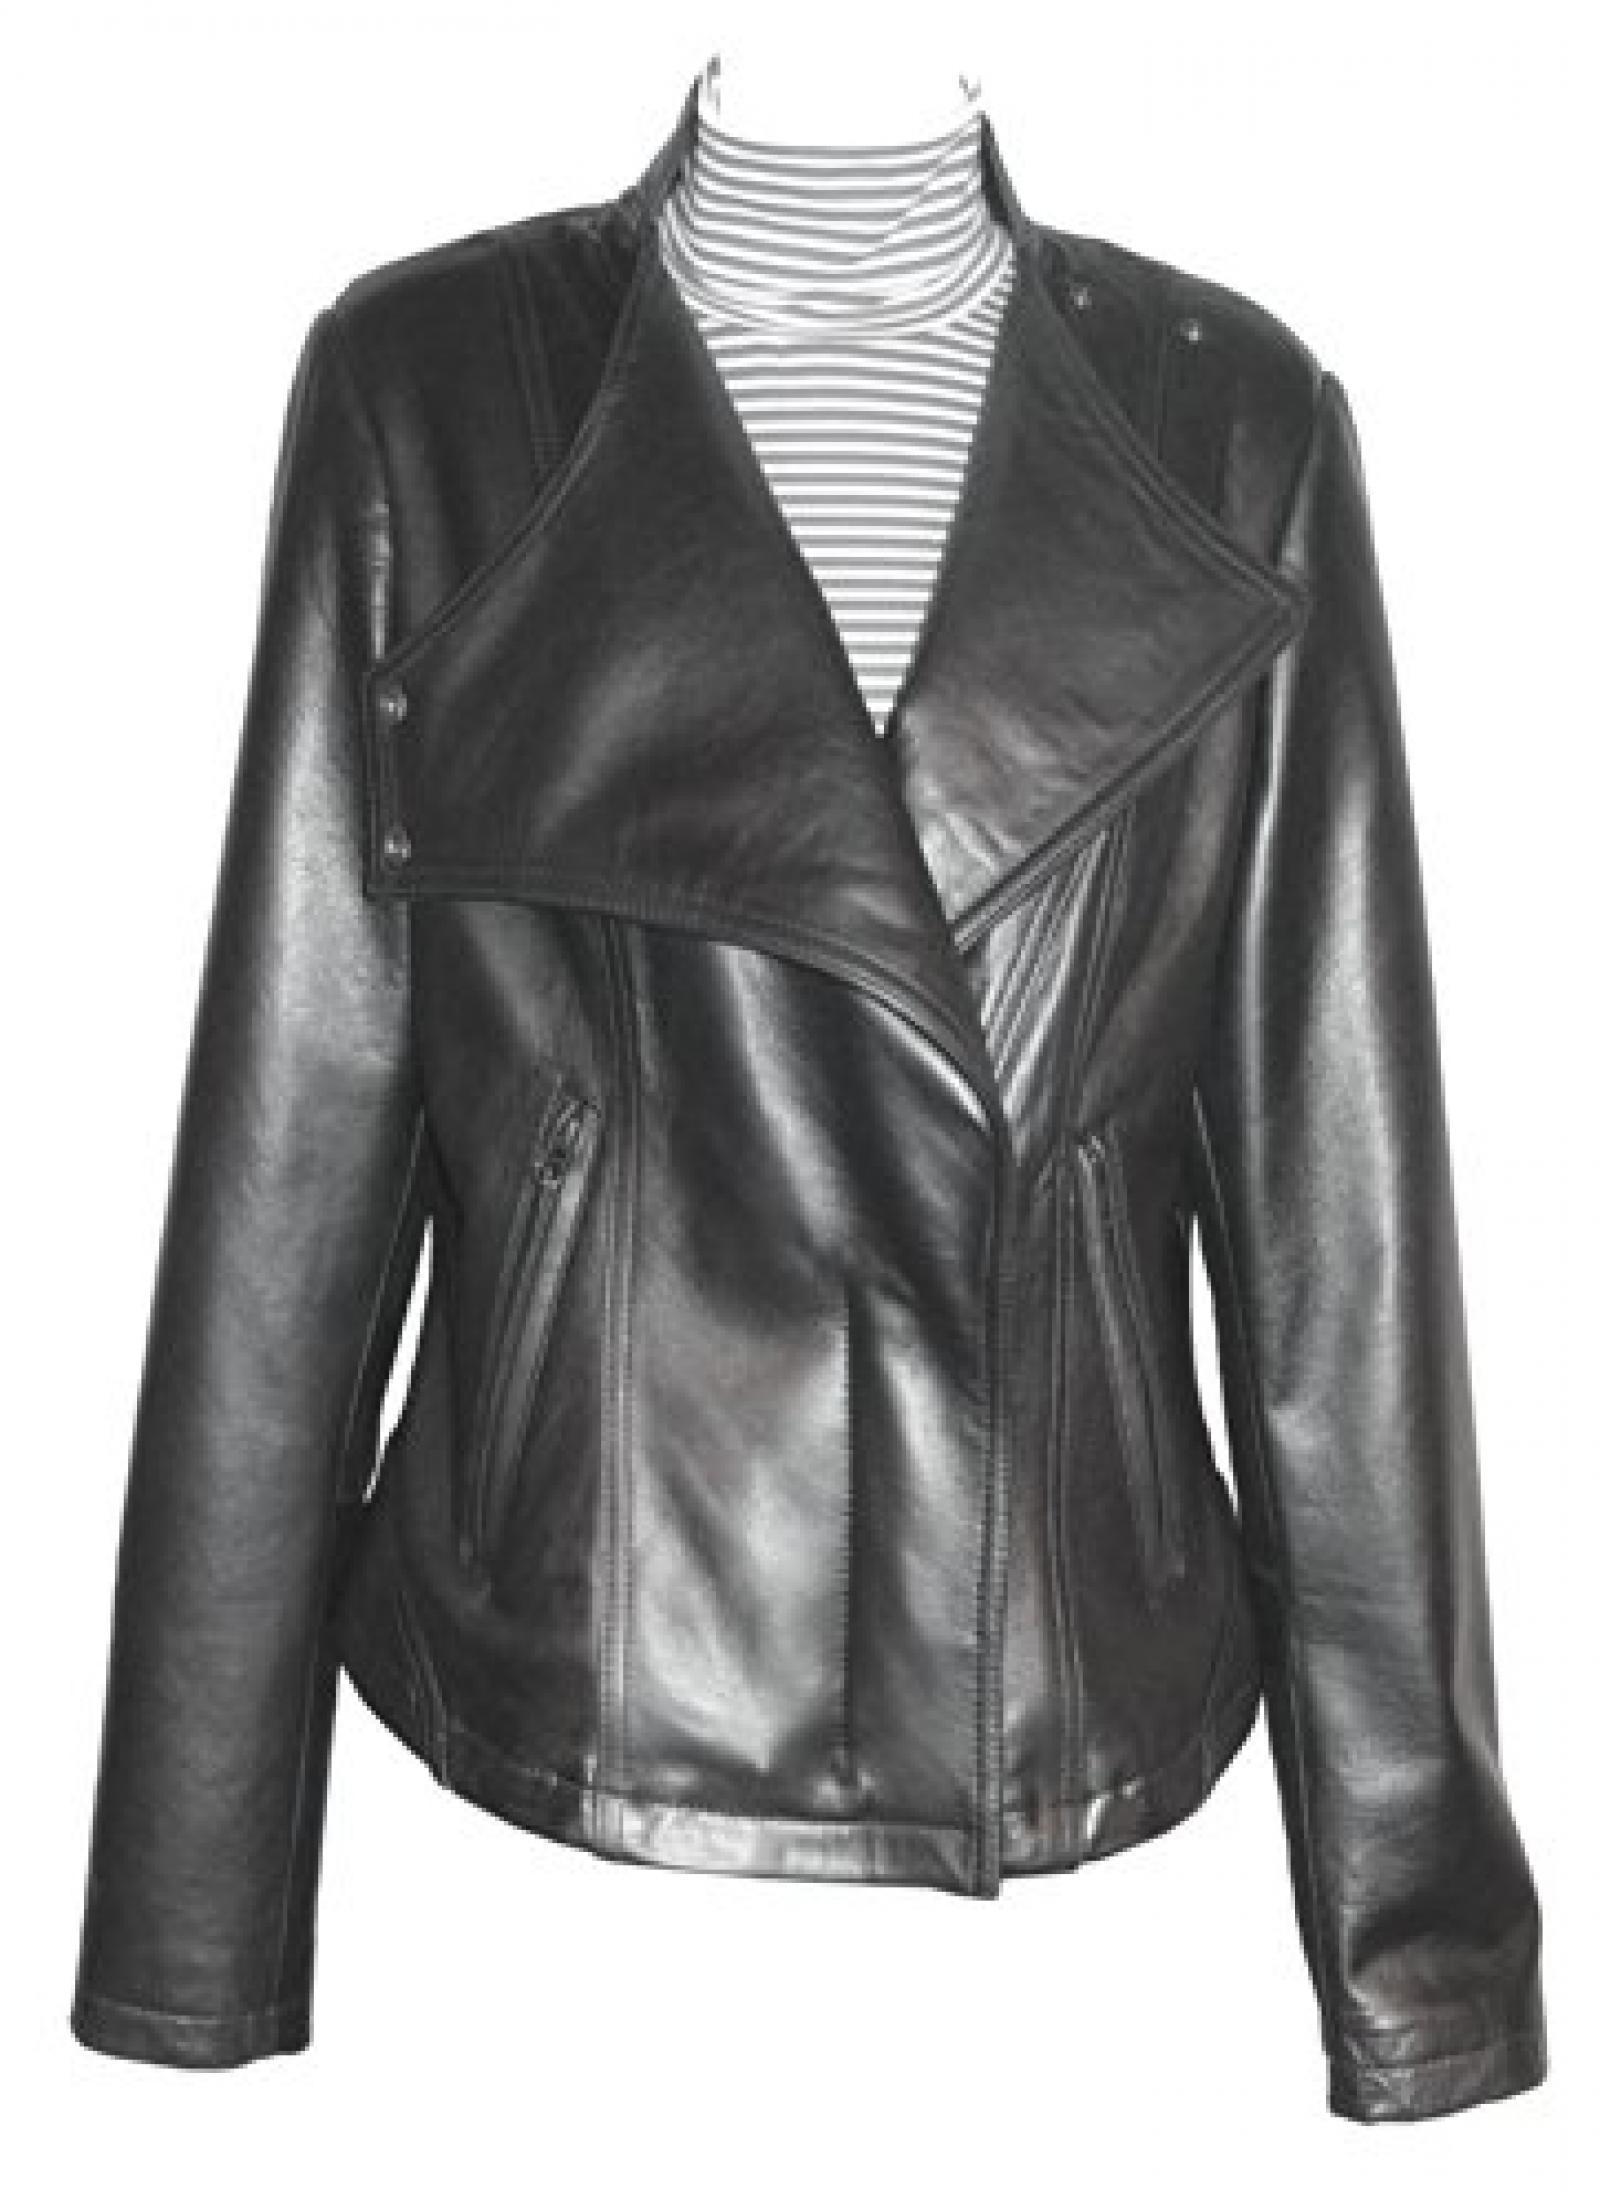 Nettailor FREE tailoring Women PETITE SZ 4093 Leather Moto Jacket Stand Collar